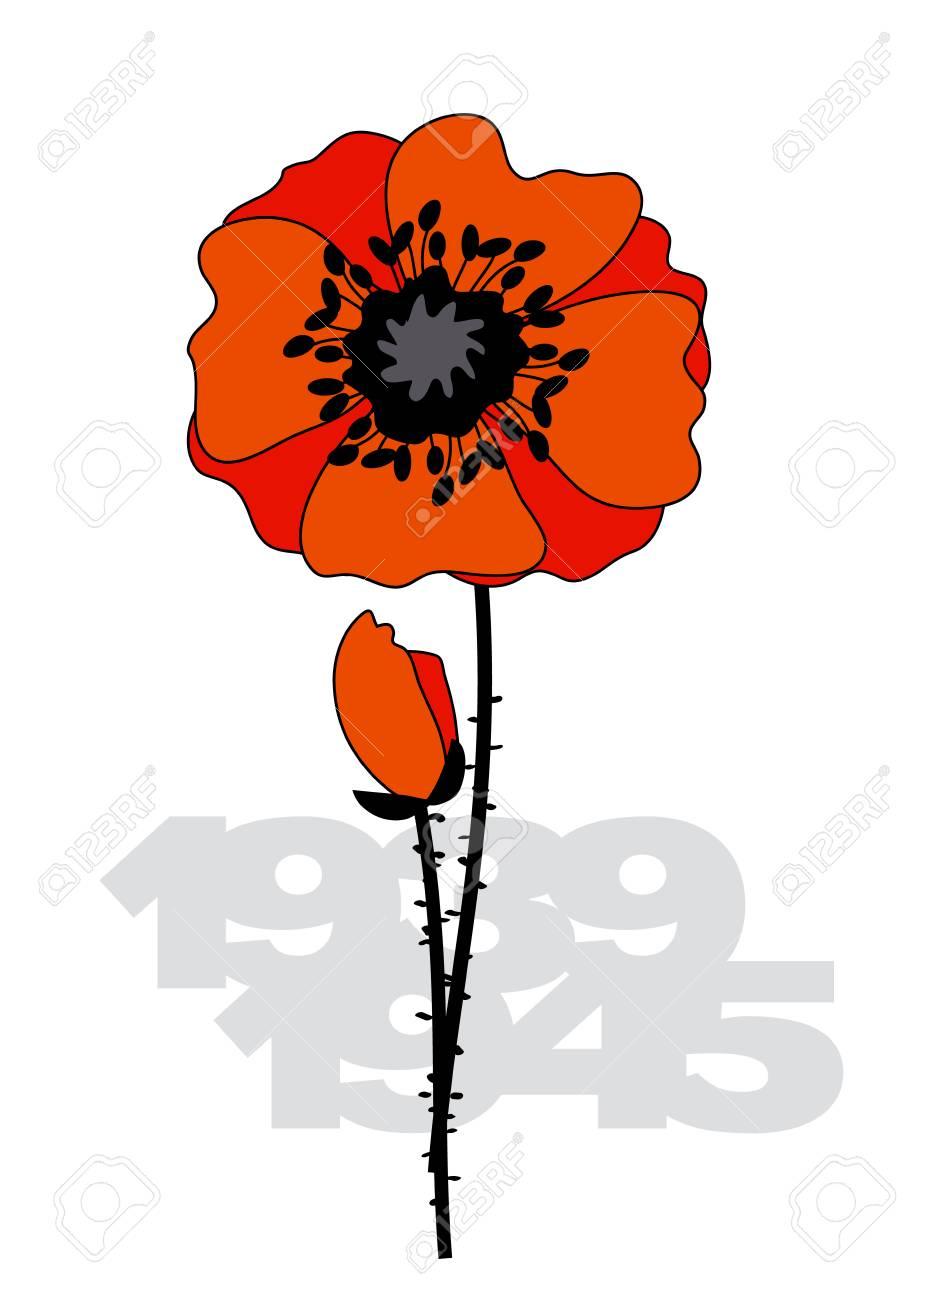 Isolated poppy flower poster ii world war illustration with isolated poppy flower poster ii world war illustration with poppy flower and years numbers stock mightylinksfo